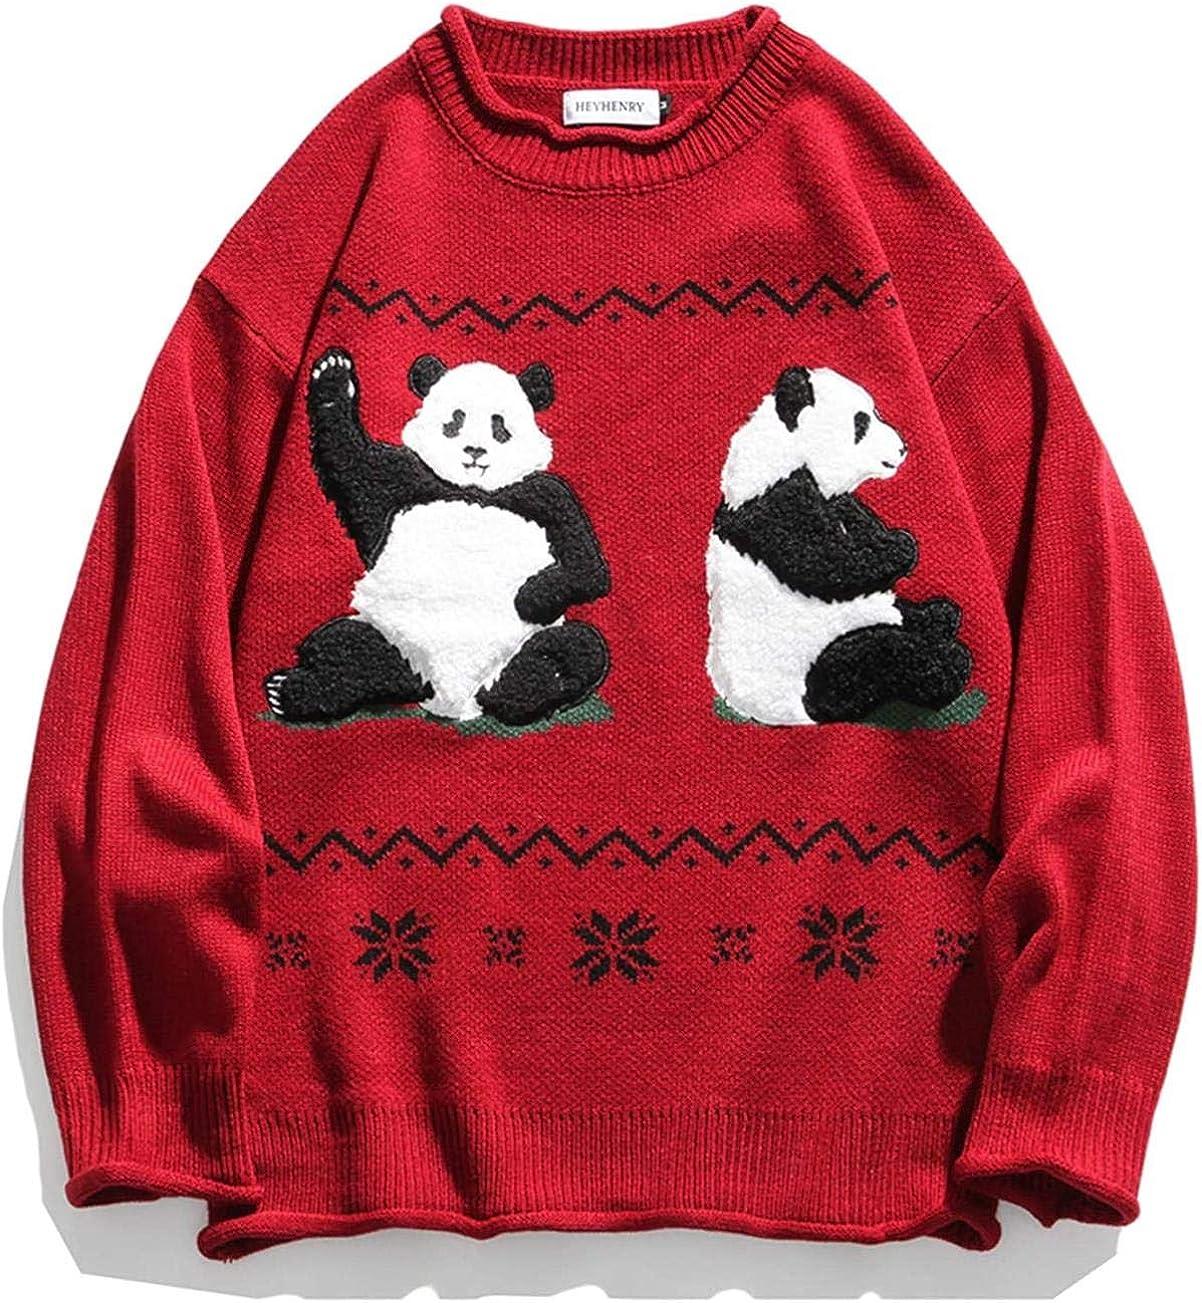 Oversize Sale price Sweaters Save money Men Winter High Pullov Streetwear Fashion Mens